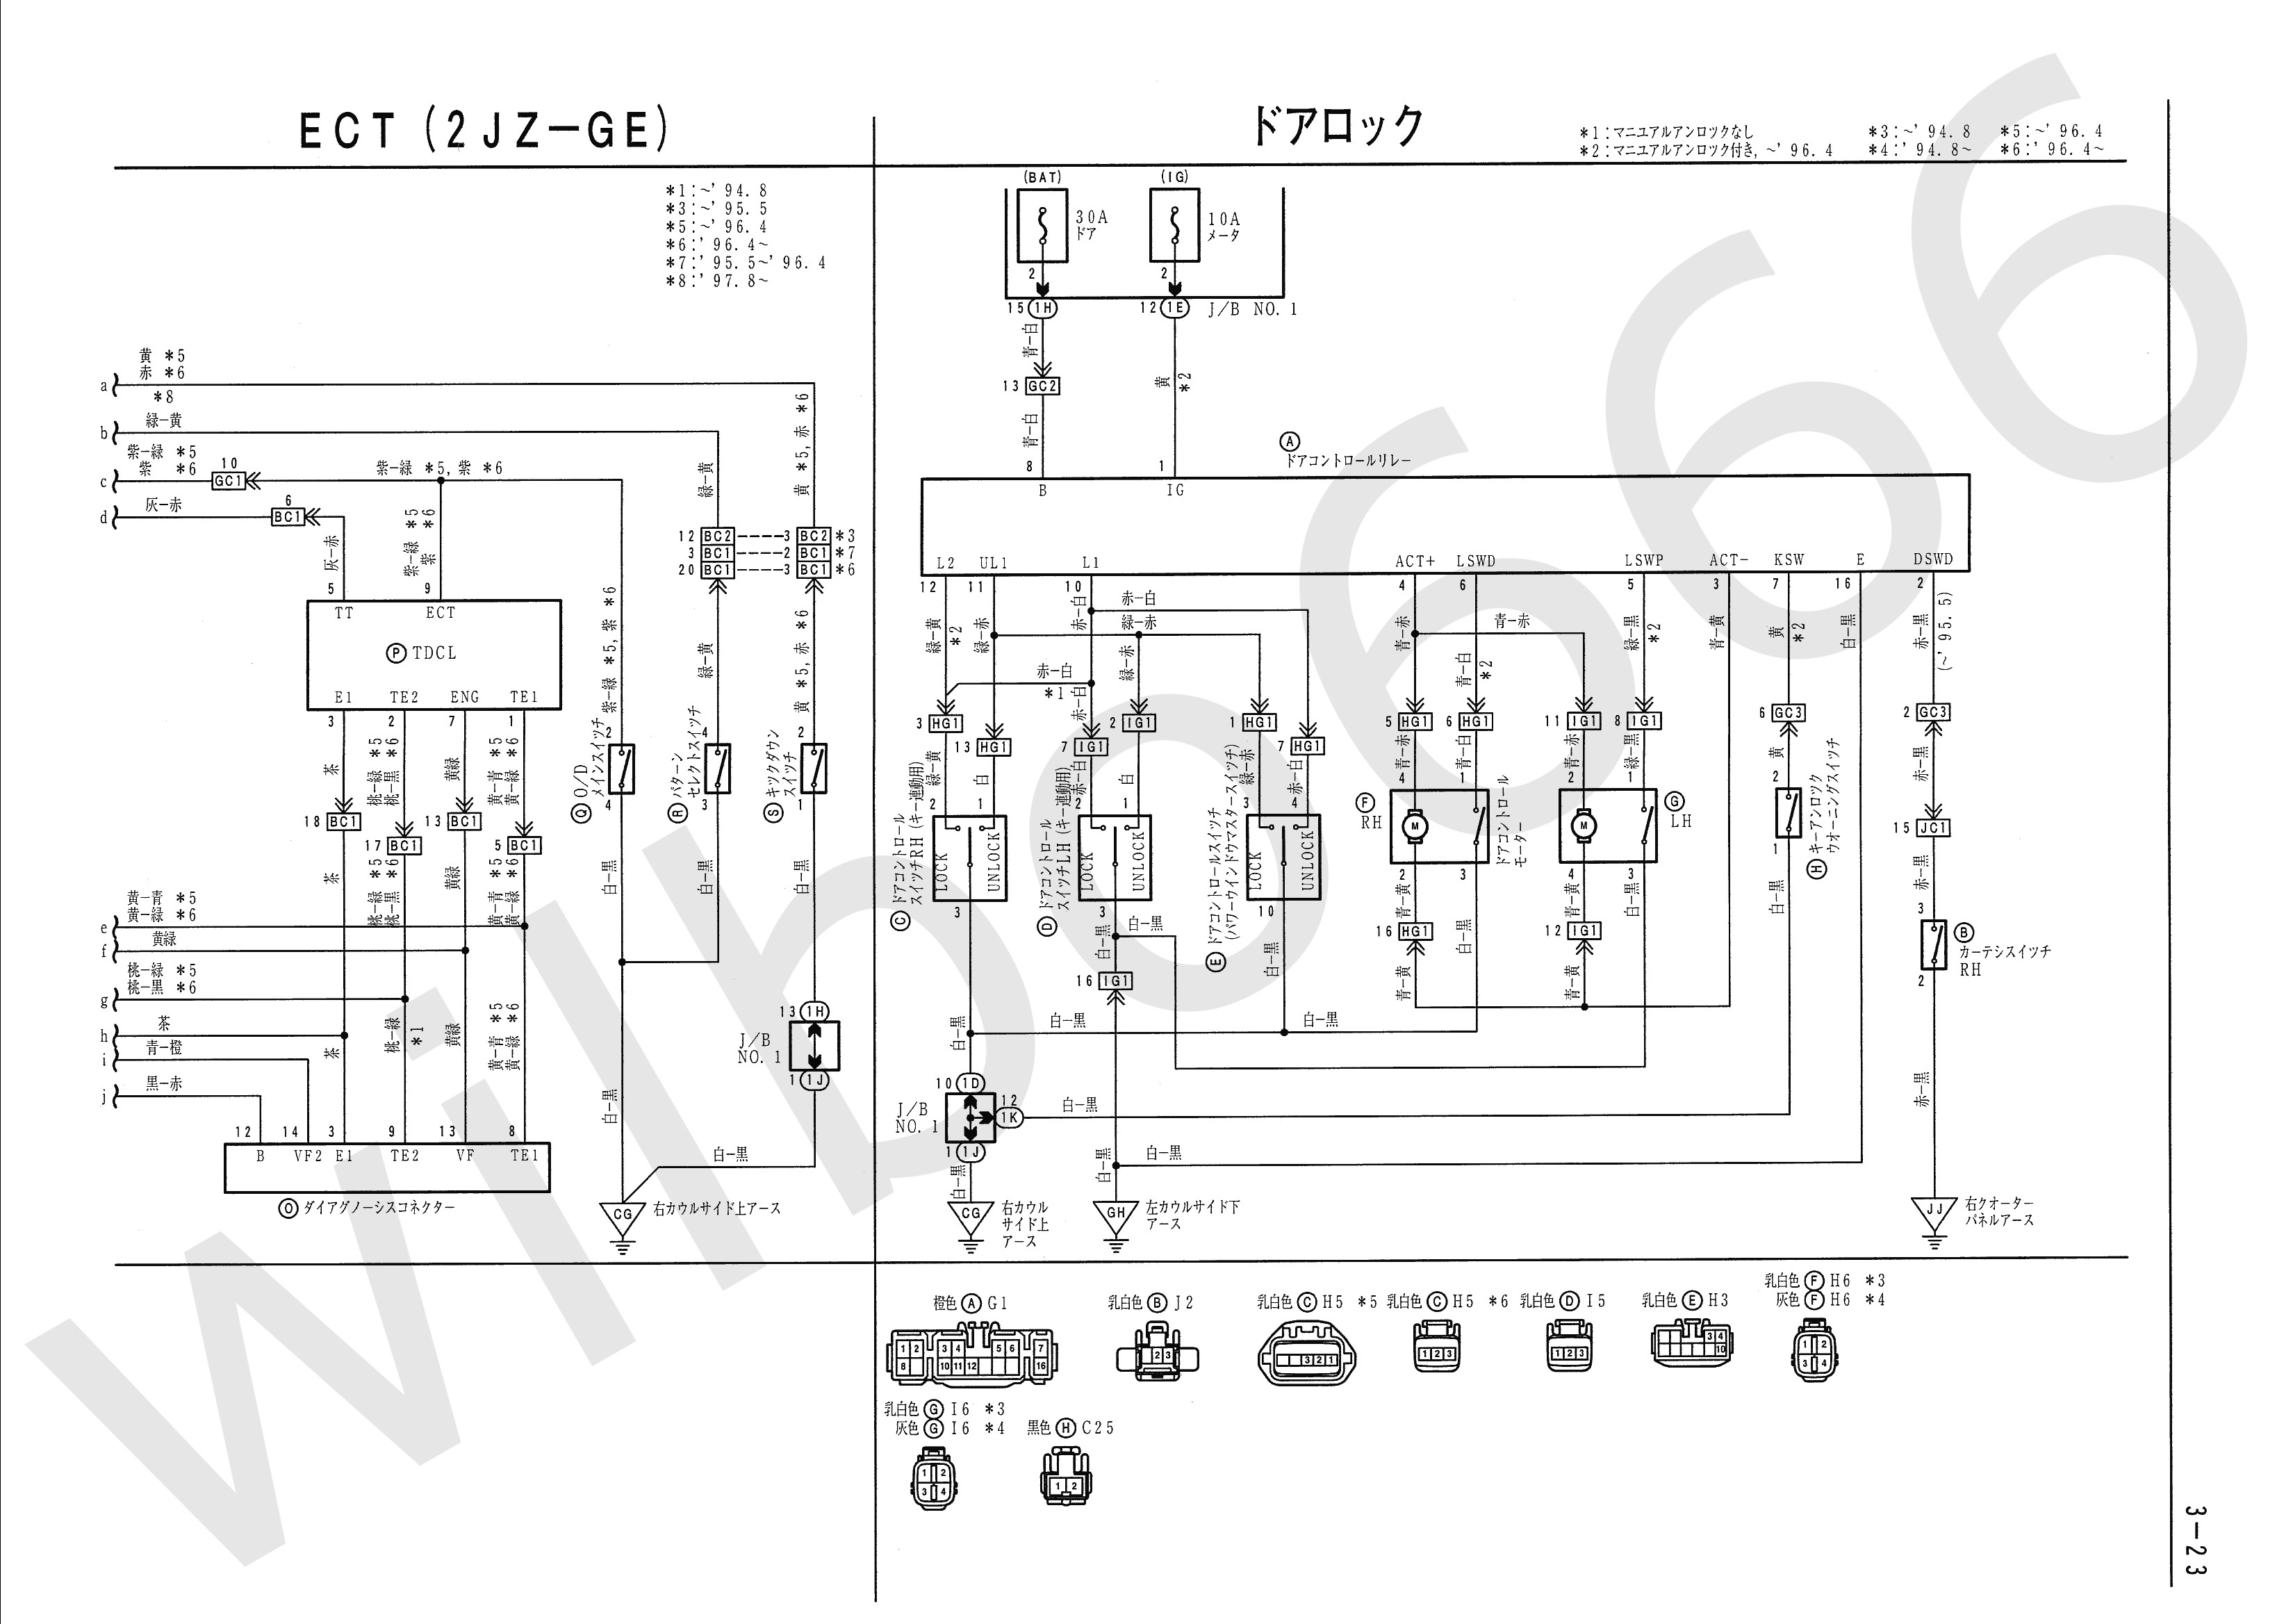 Engine Coolant Temperature Sensor Wiring Diagram Wilbo666 2jz Ge Jza80 Supra Engine Wiring Of Engine Coolant Temperature Sensor Wiring Diagram